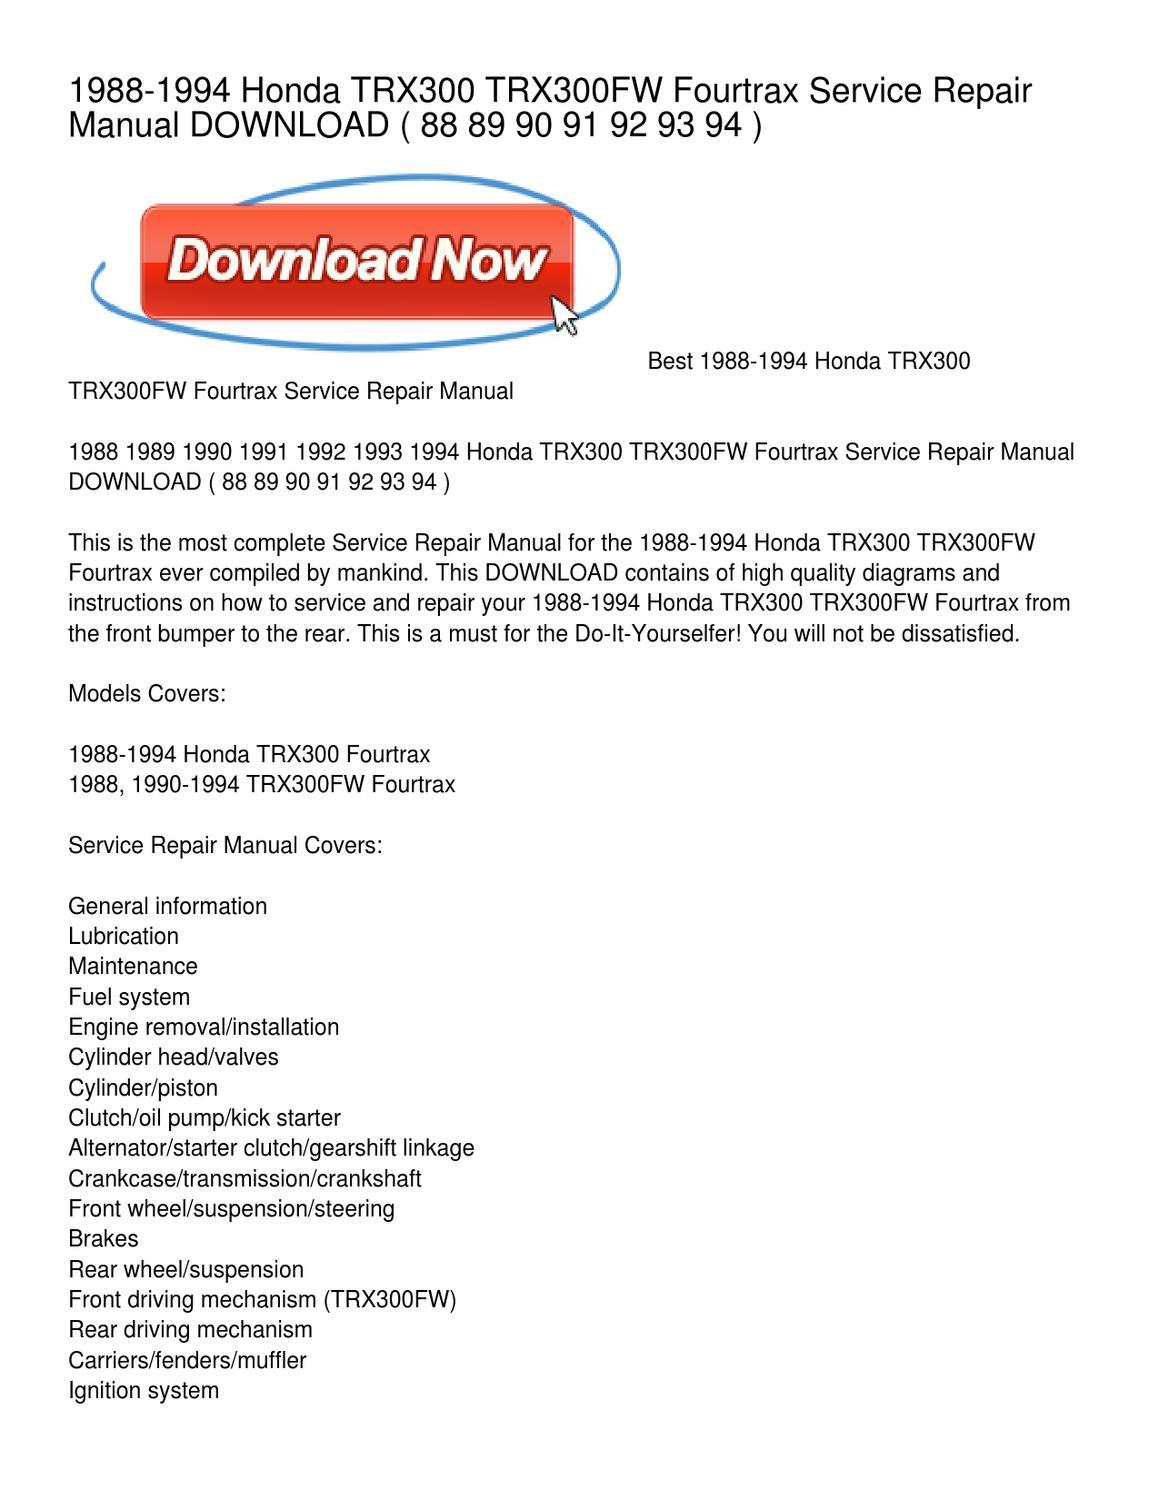 1988-1994 Honda TRX300 TRX300FW Fourtrax Service Repair Manual DOWNLOAD by  Brandon Smith - issuu